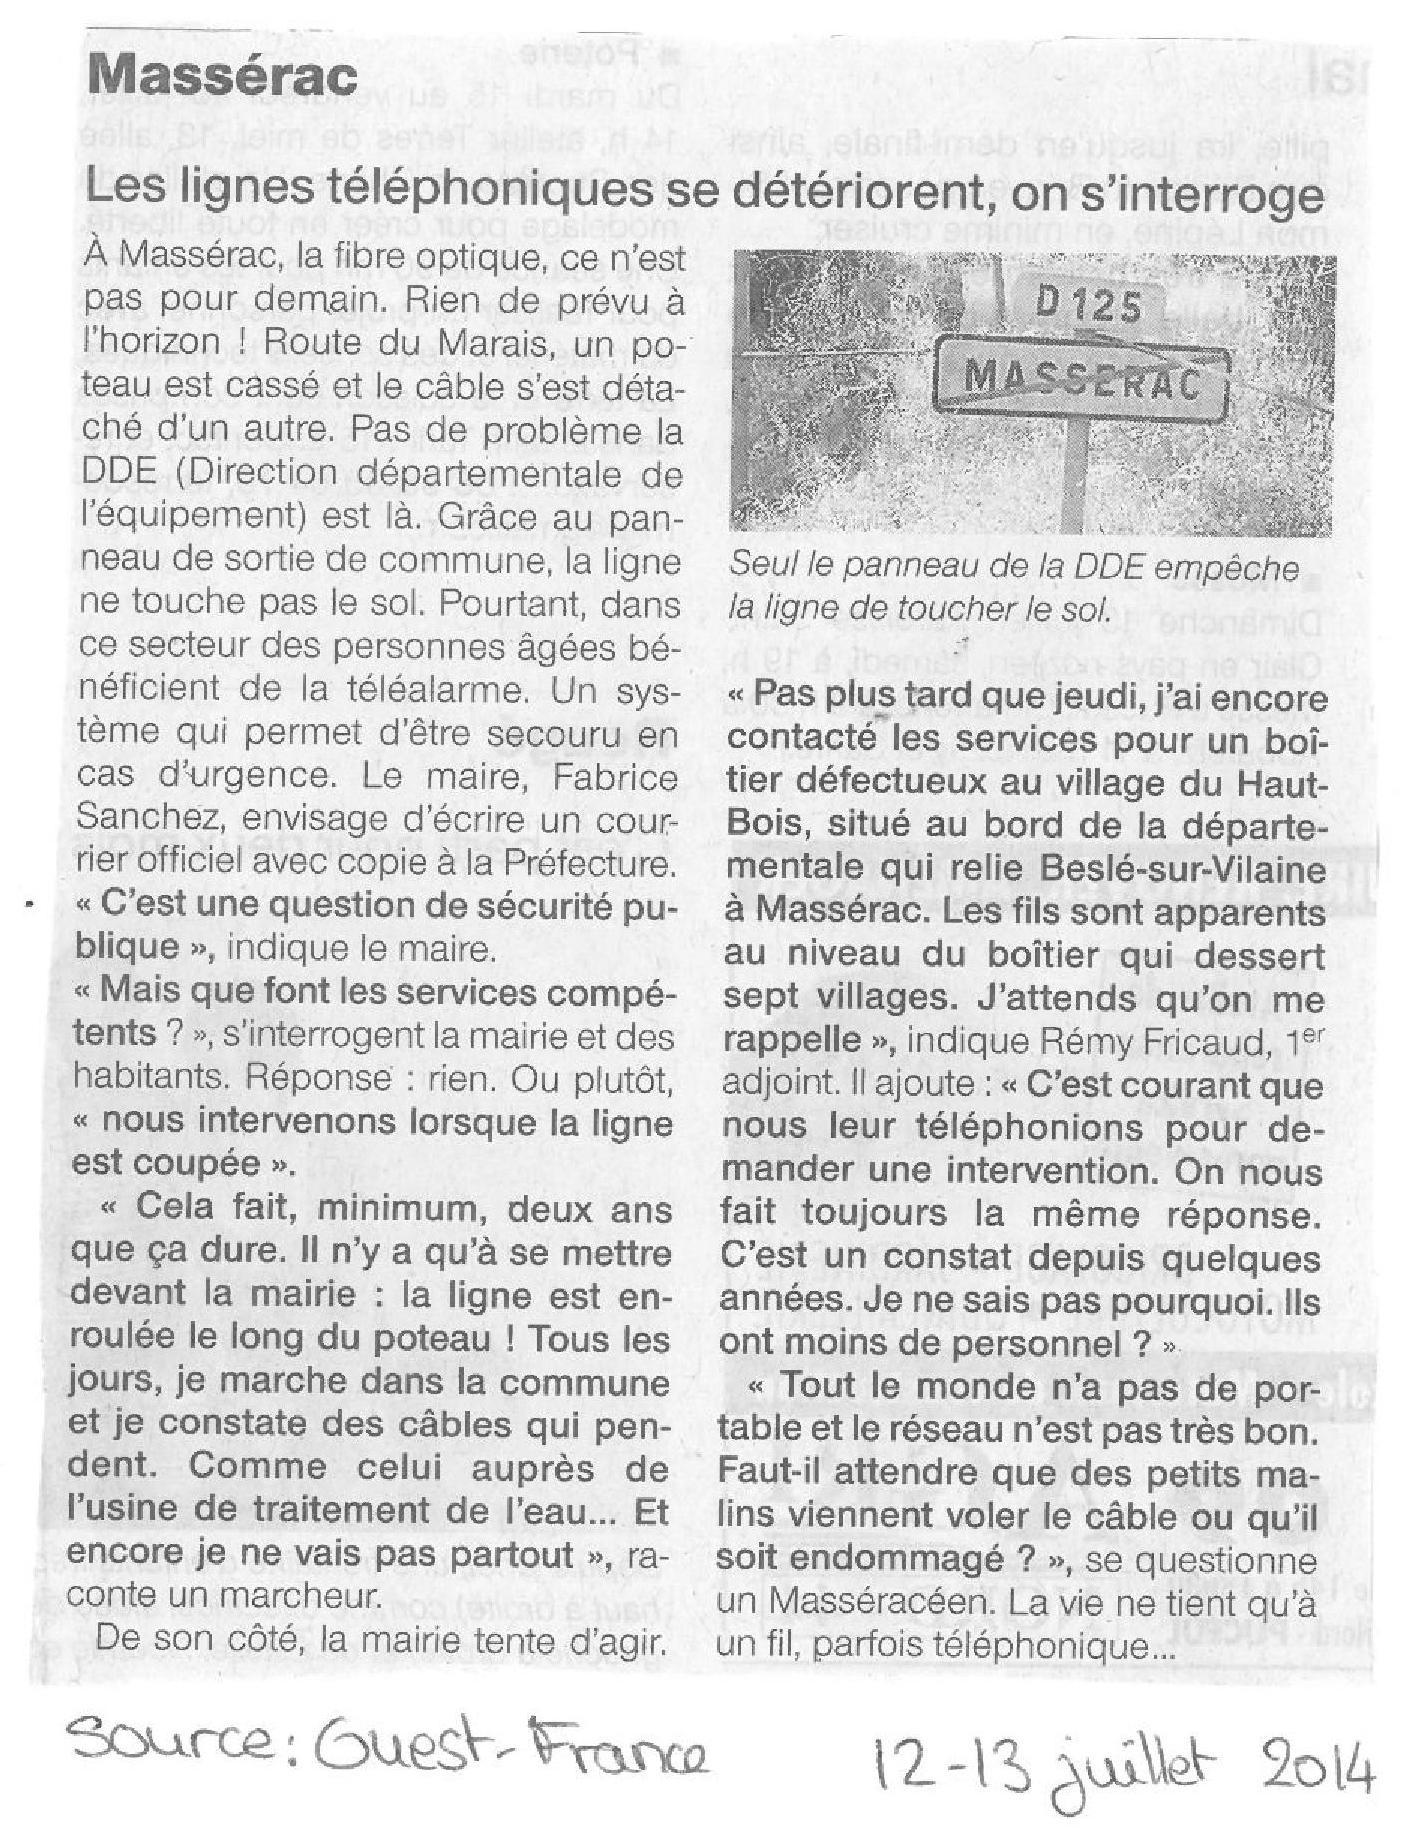 ouest-france-12-13-juillet-2014-page-001